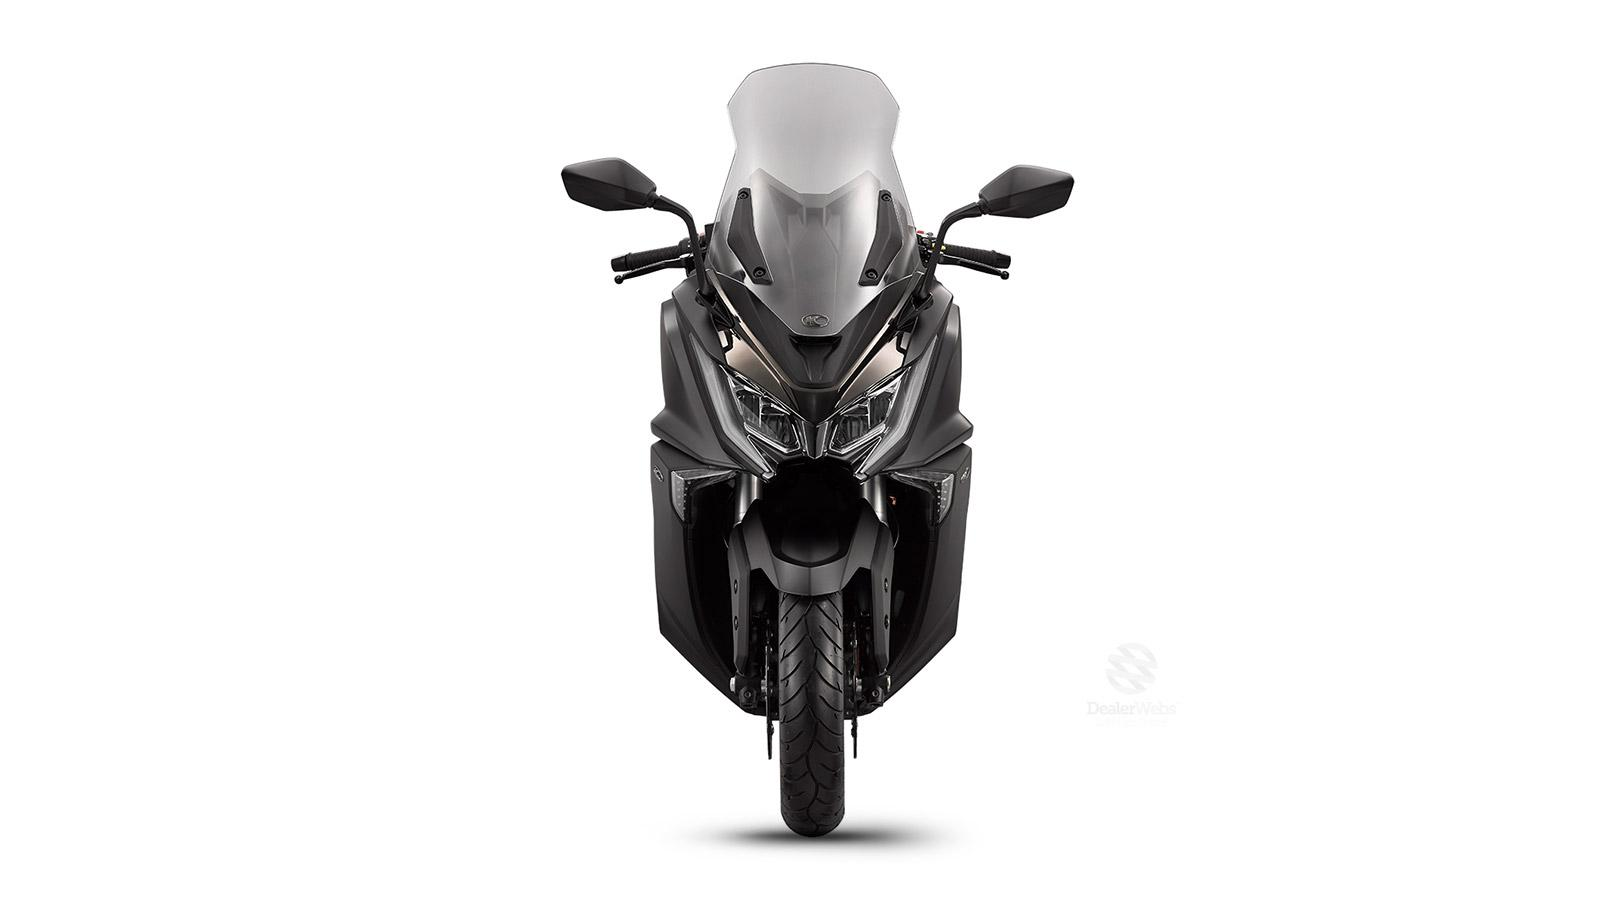 Kymco AK 550 2021 E5